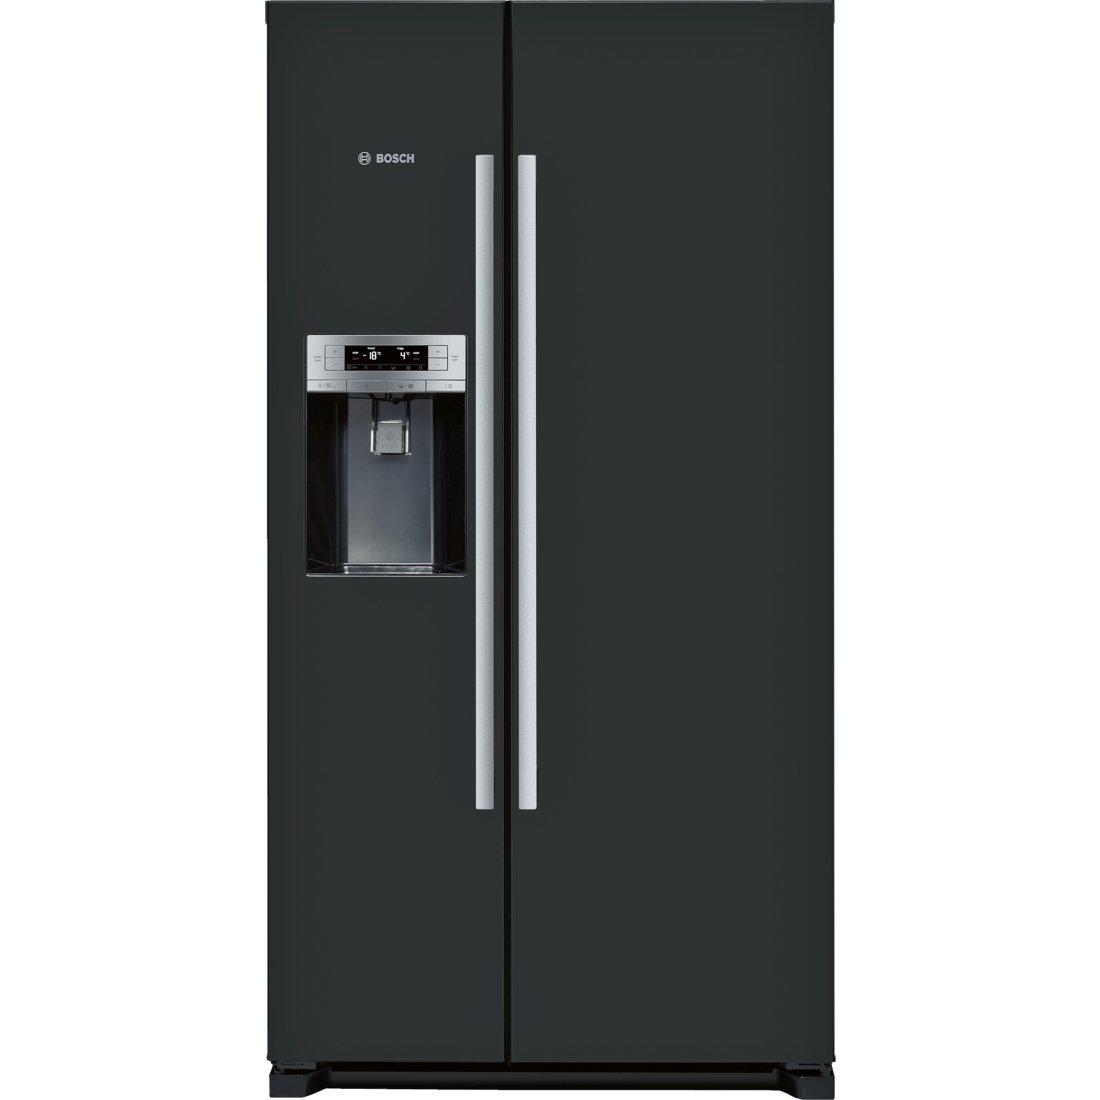 Bosch Serie 6 KAD90VB20 - Frigorifero side-by-side, indipendente, porta americana, classe climatica SN/T, A+, LED, colore: Nero